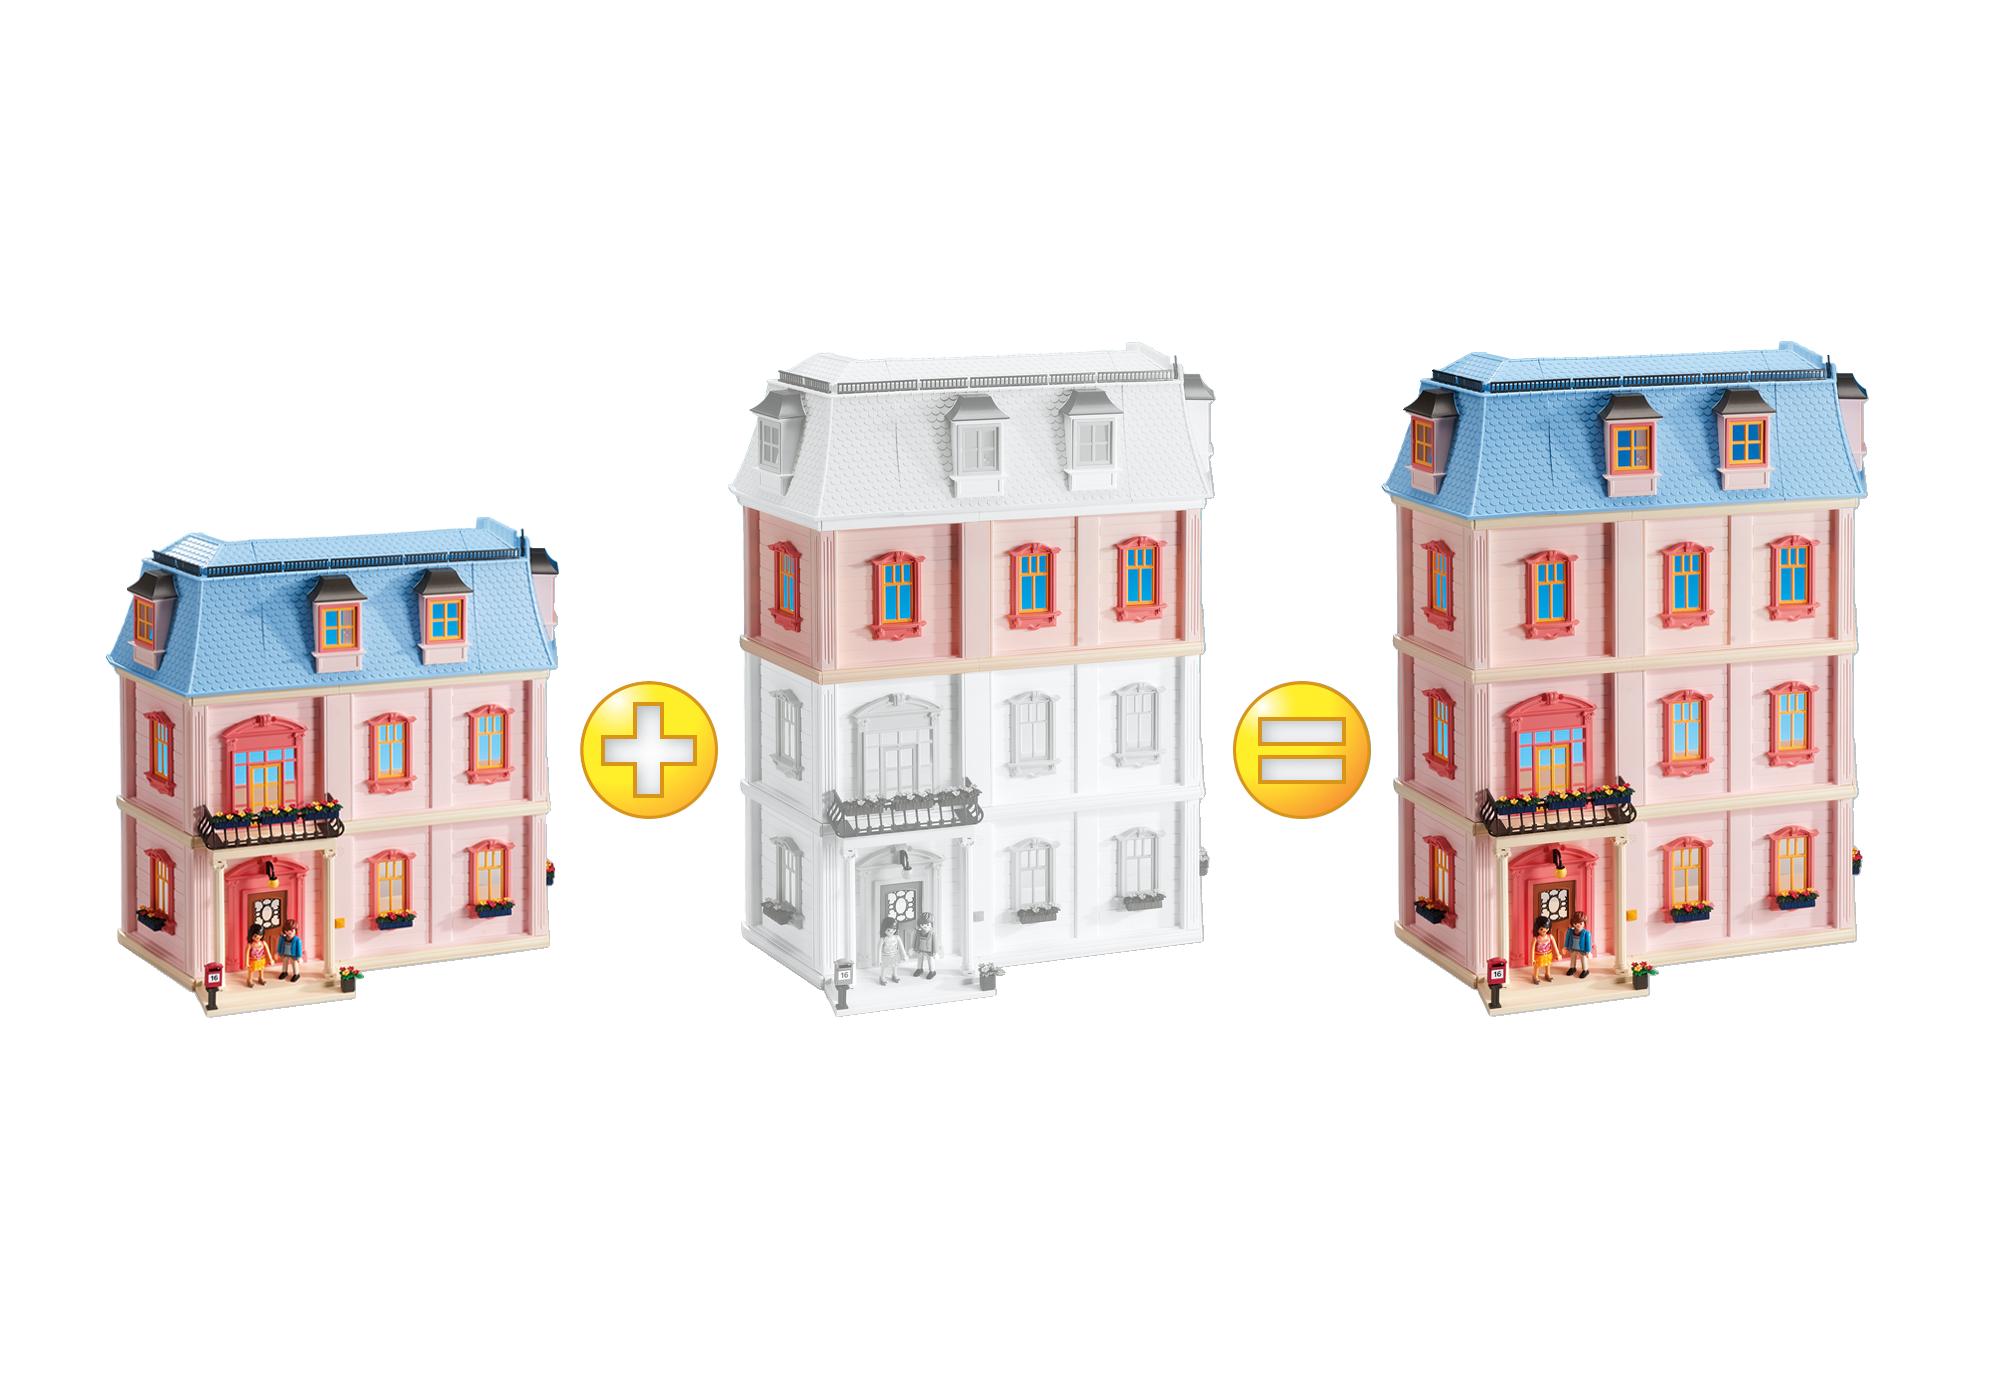 Playmobil Ausmalbilder Luxusvilla : Gro Z Gig Ausmalbilder Playmobil Kinderzimmer Bilder